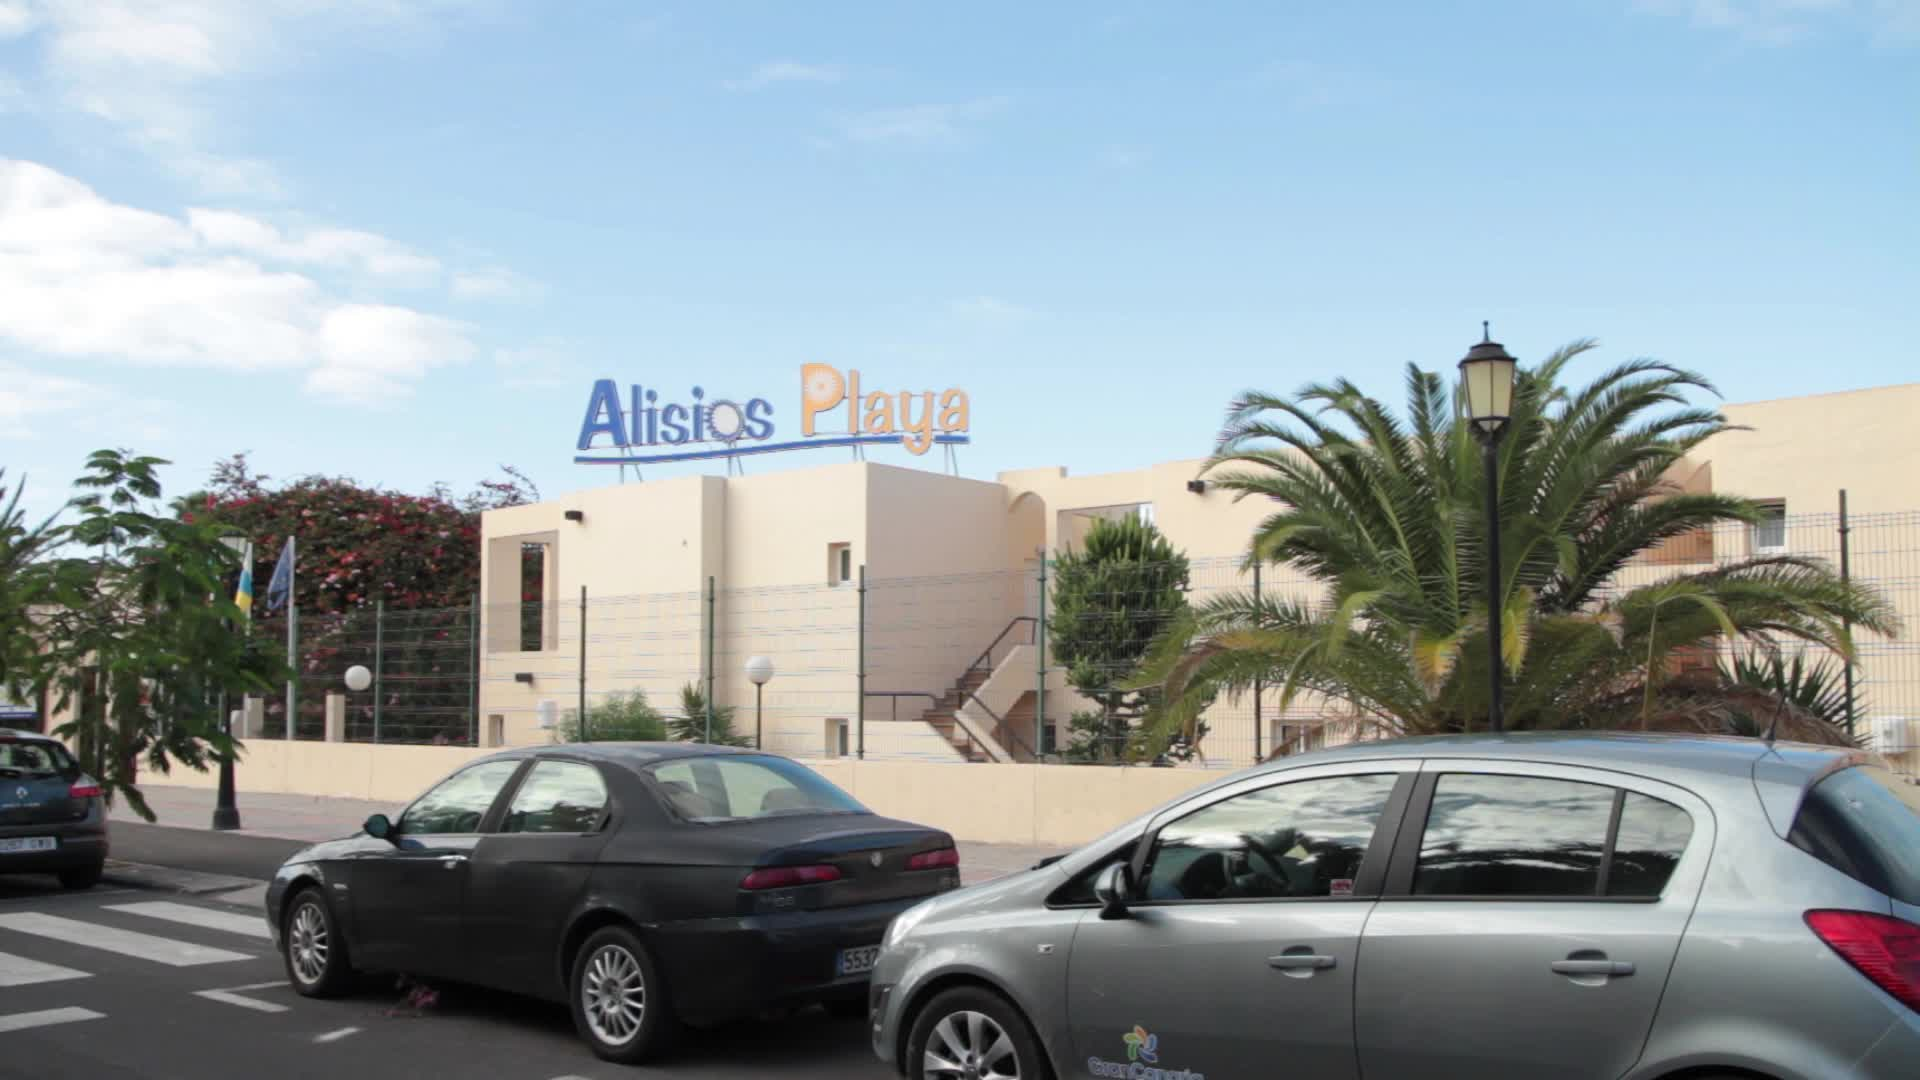 Alisios Playa